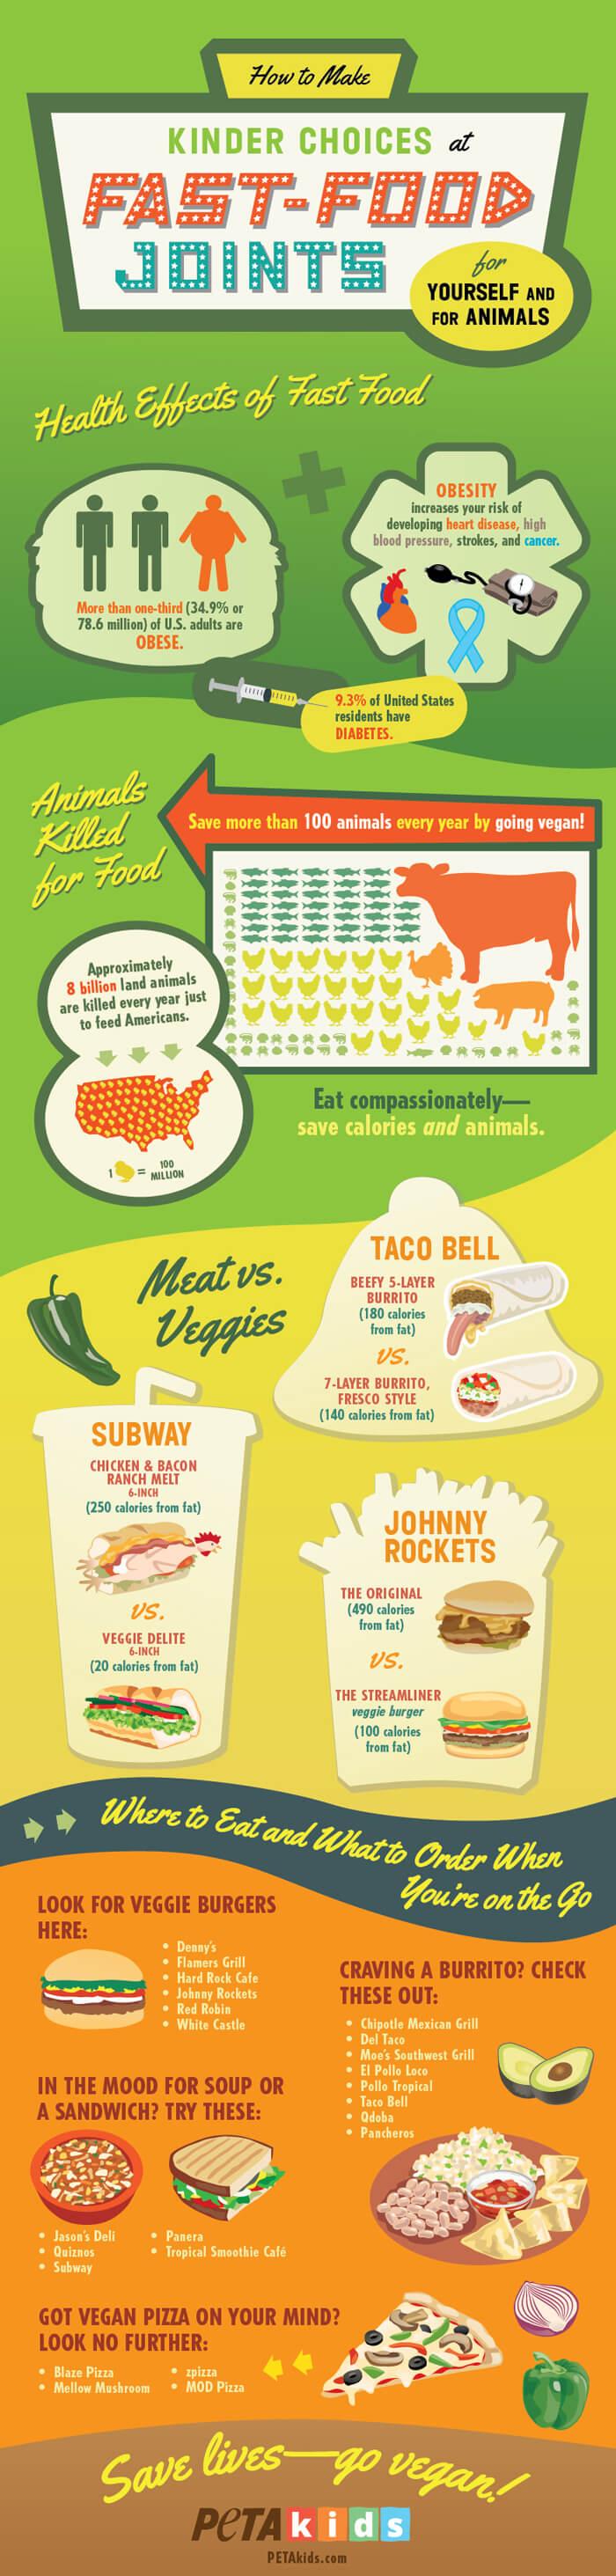 vegan fast food infographic